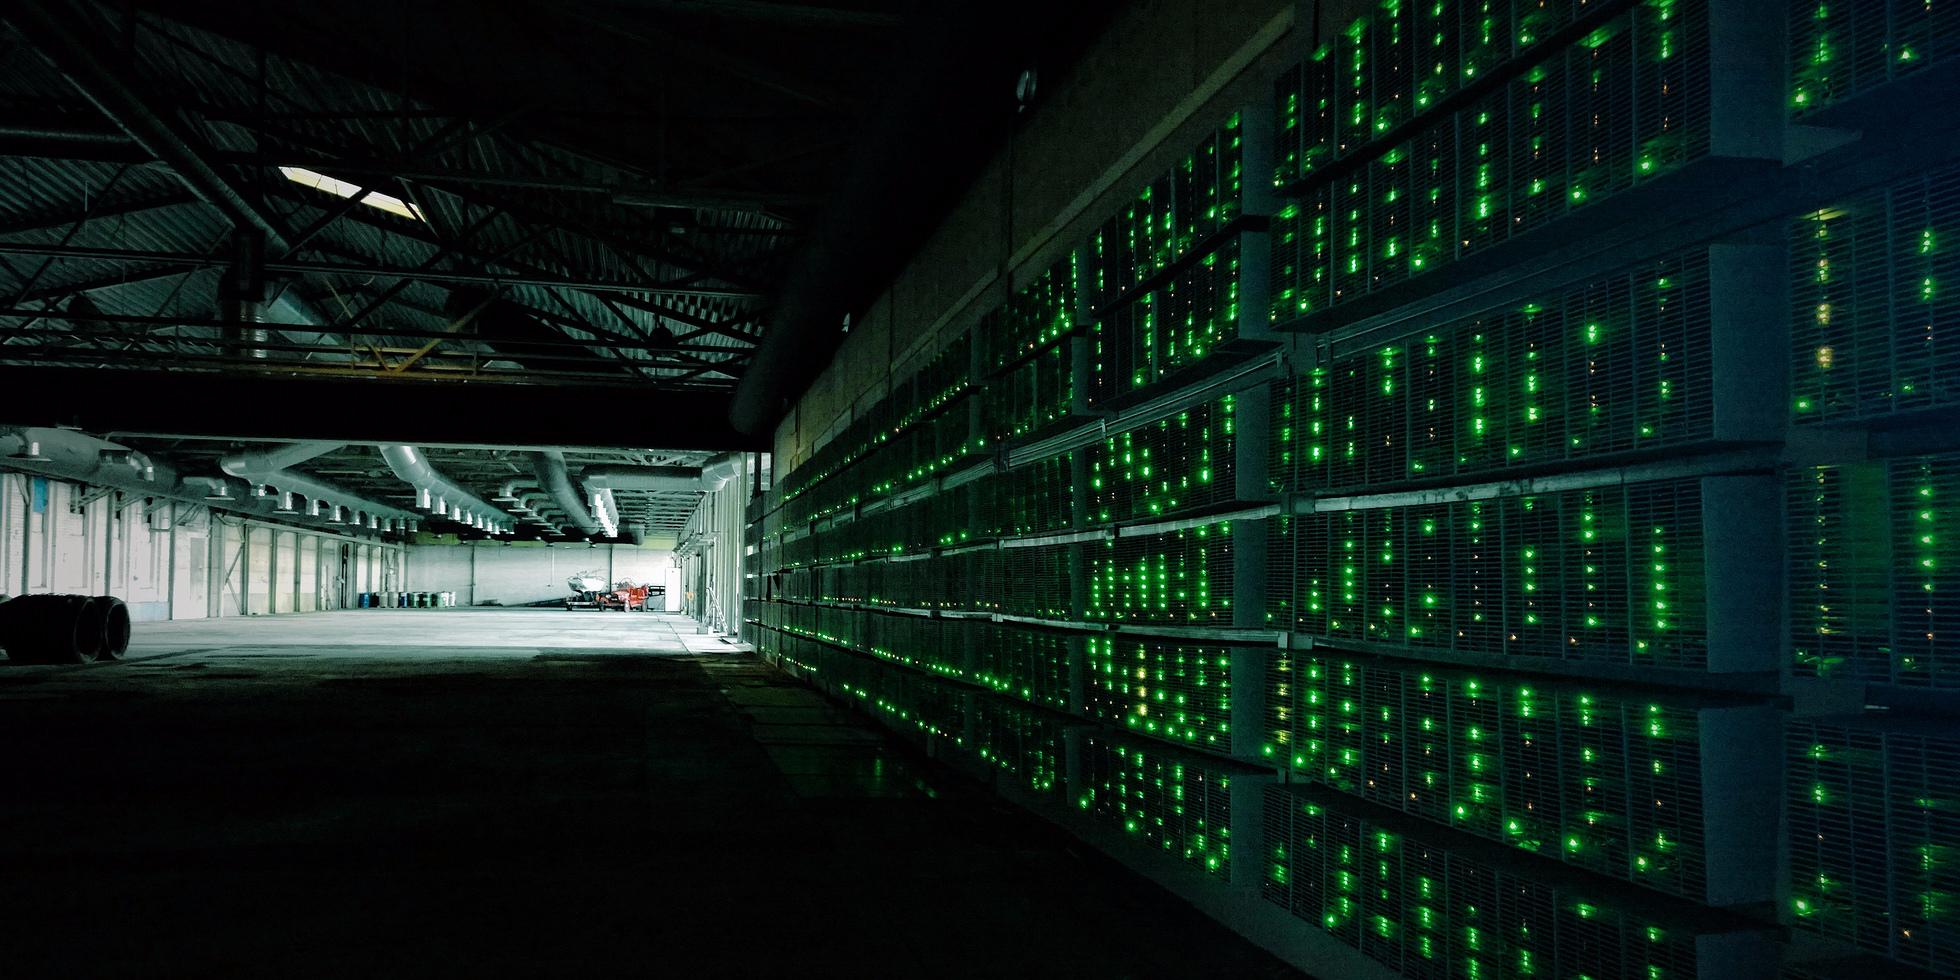 electric drive trucks mining bitcoins